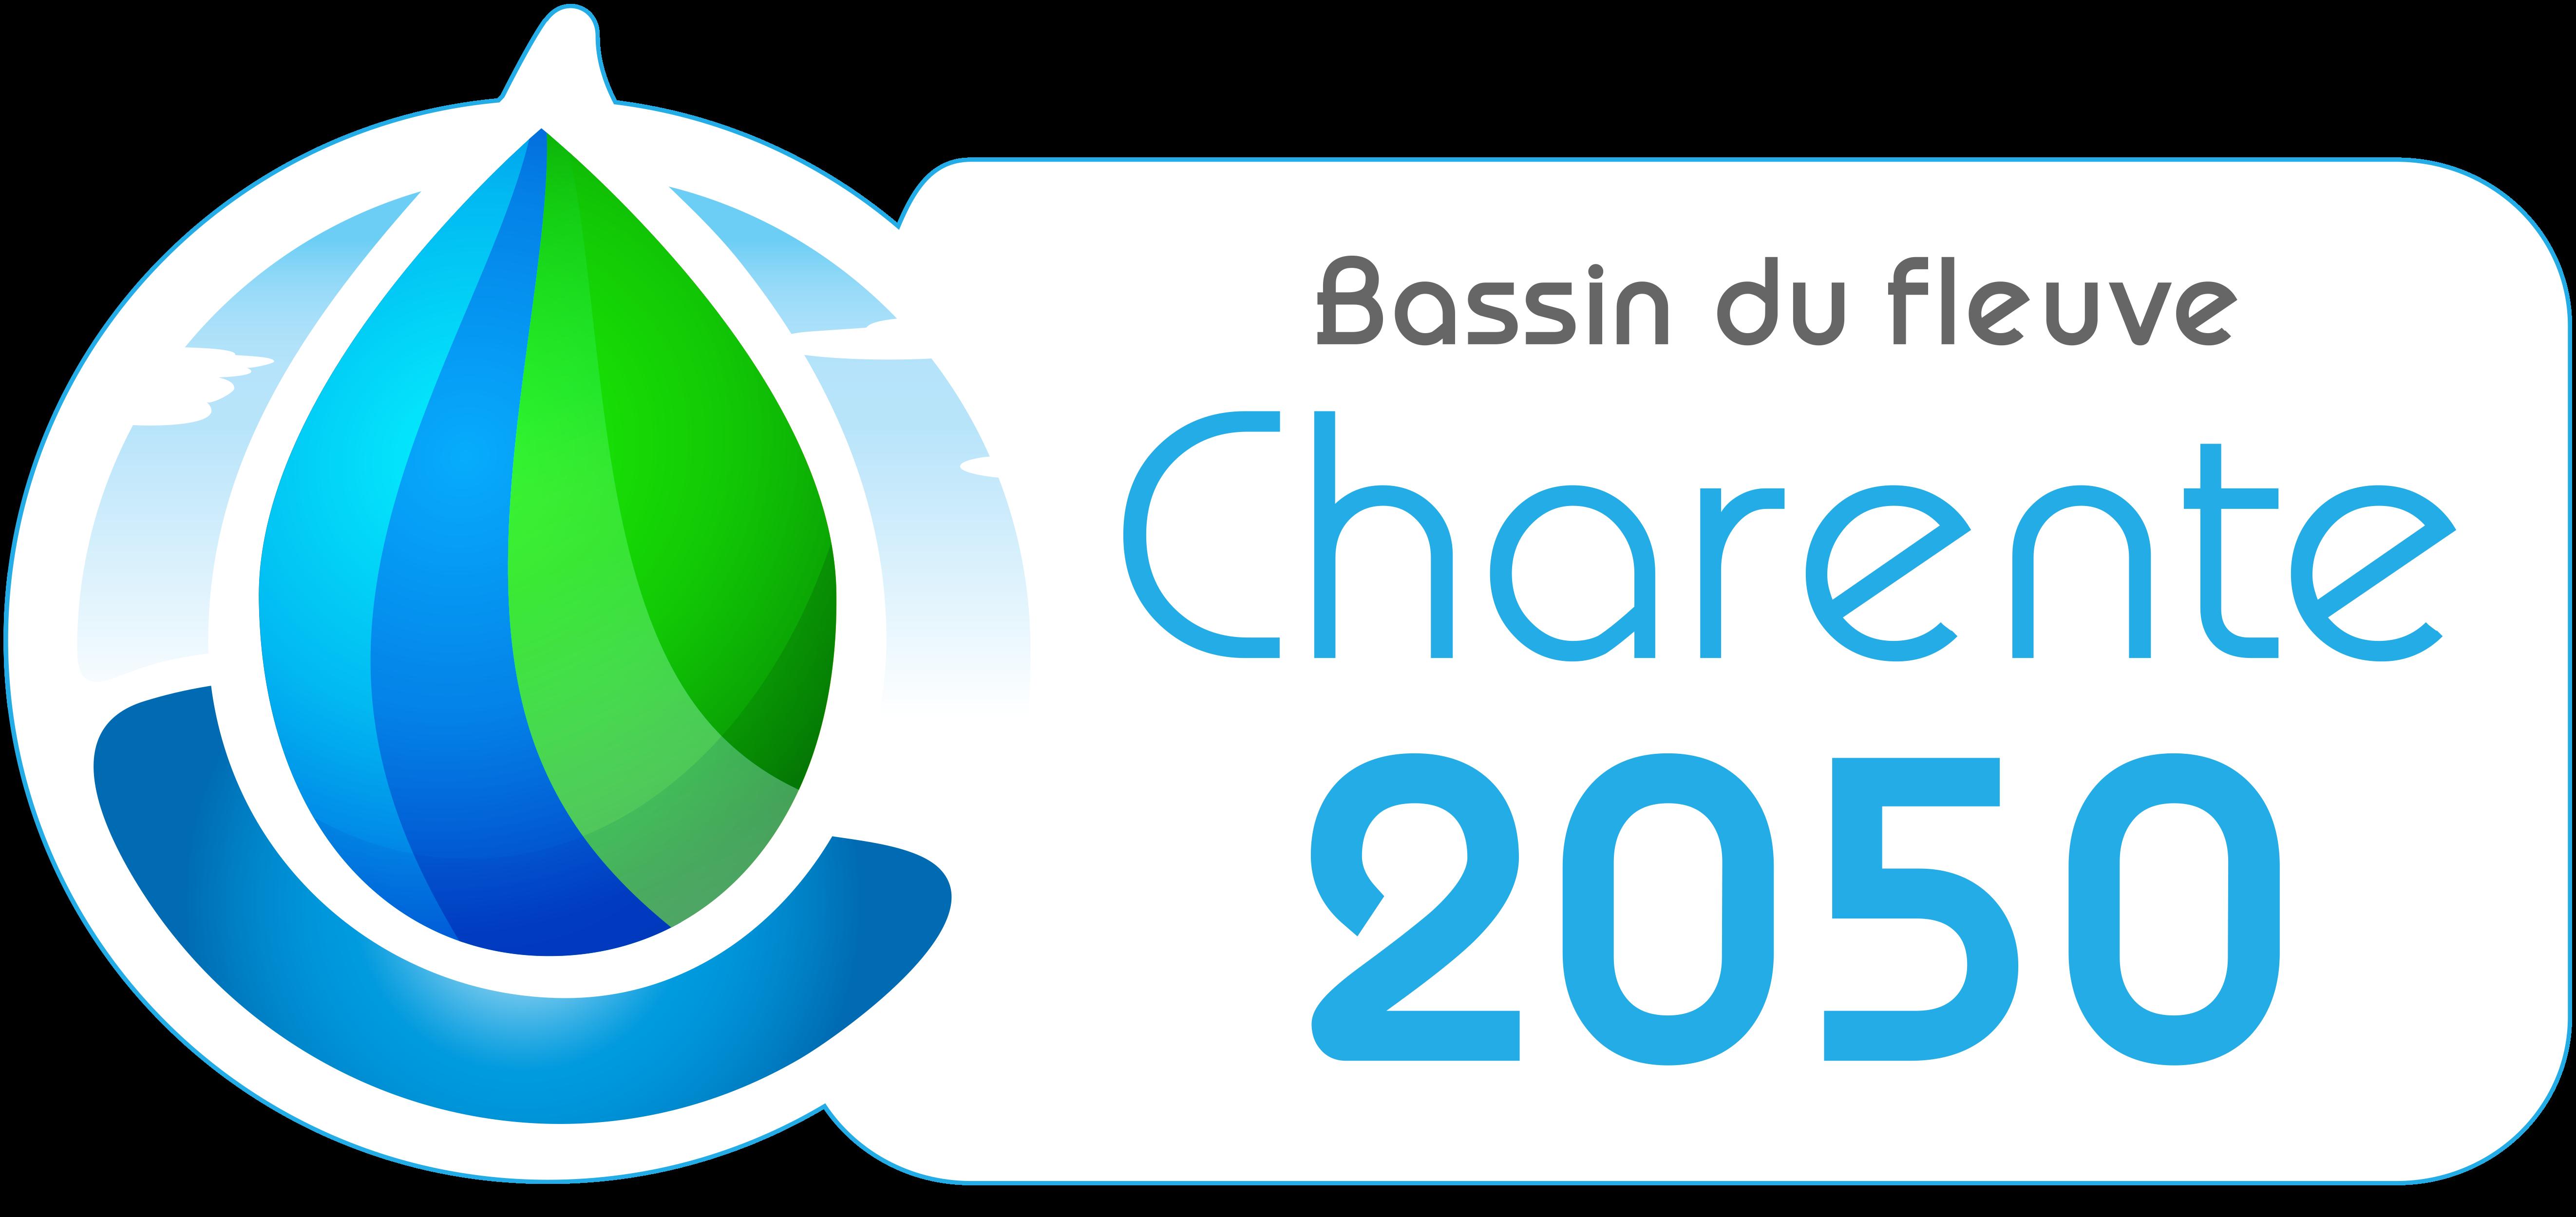 Charente 2050